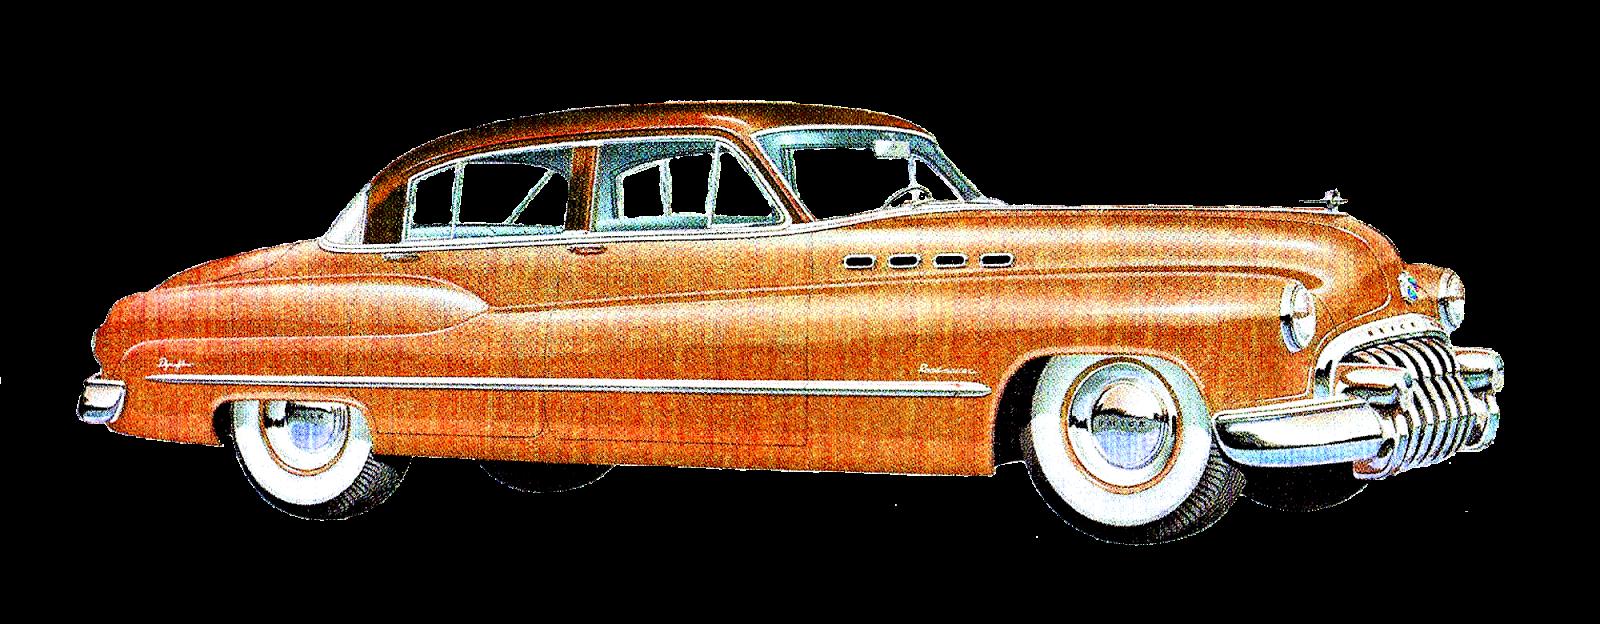 Free cliparts download clip. Clipart car orange